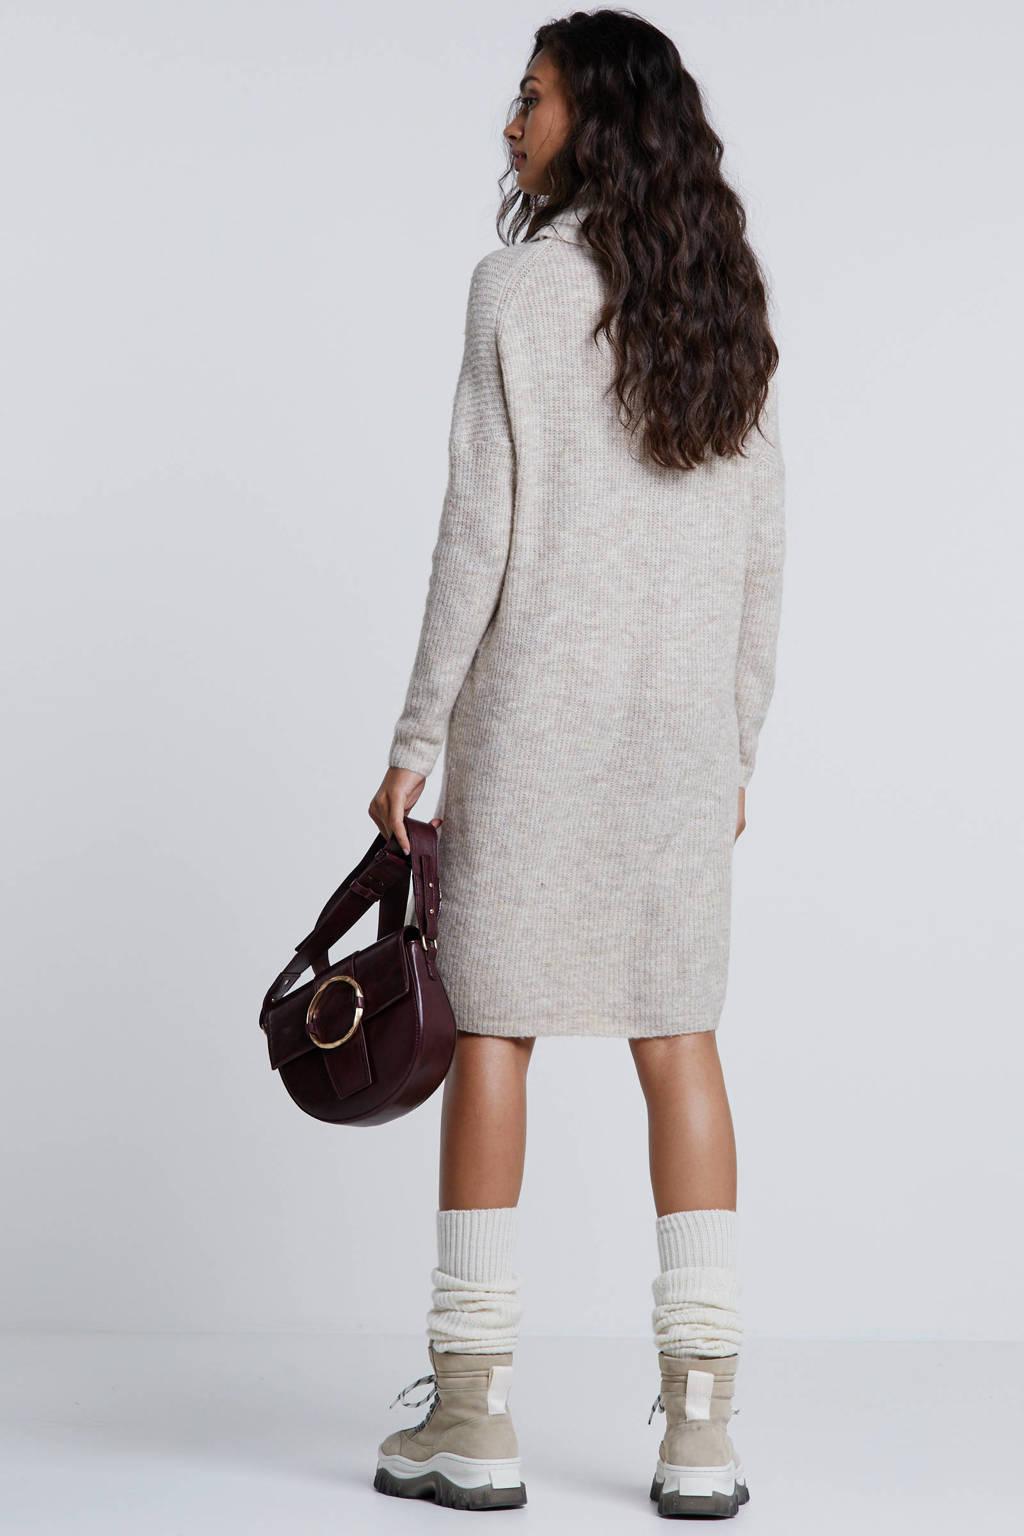 Verbazingwekkend ONLY grofgebreide jurk beige   wehkamp ND-75